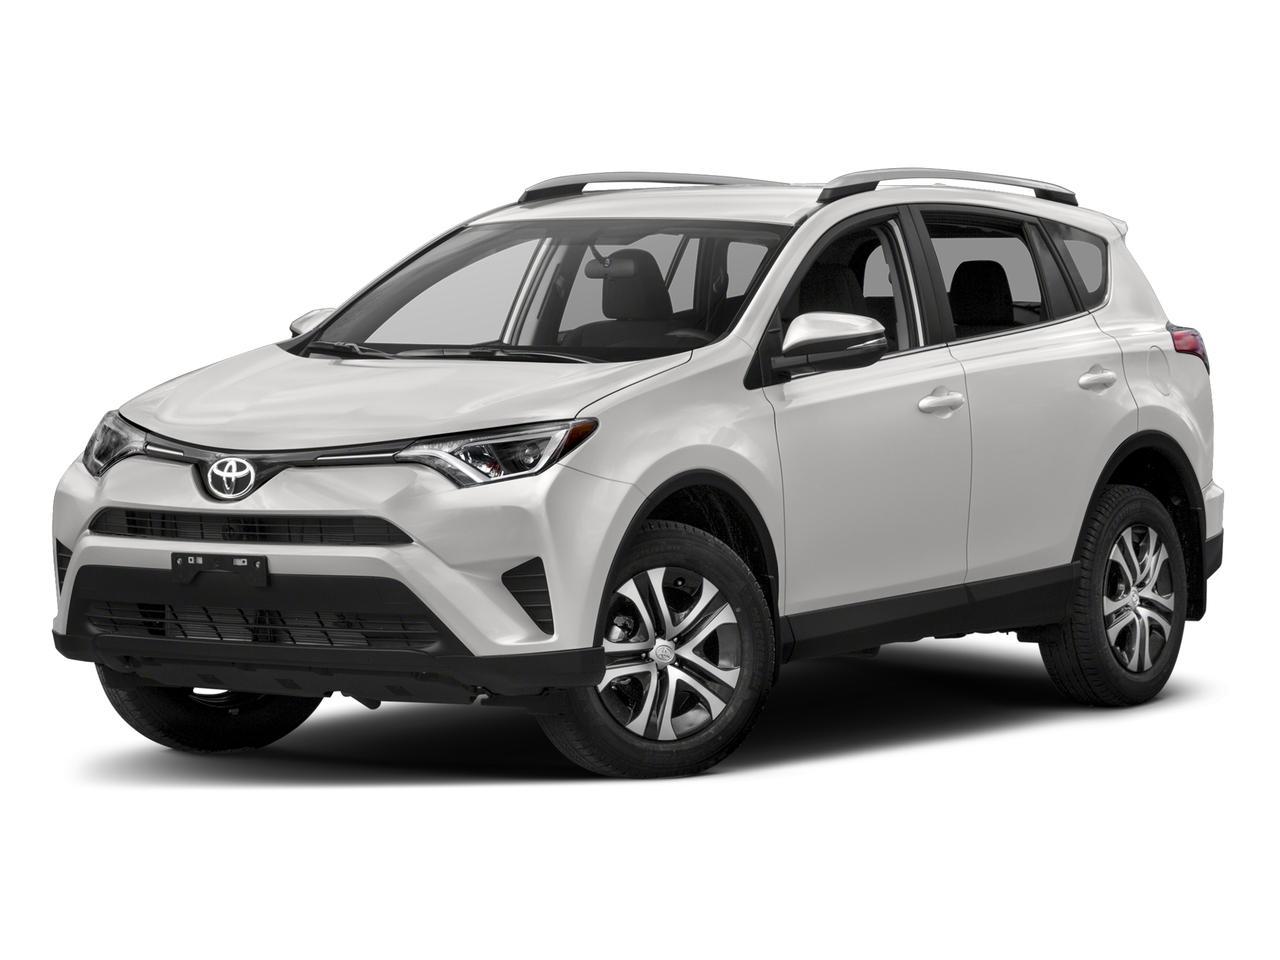 2018 Toyota RAV4 Vehicle Photo in San Antonio, TX 78257